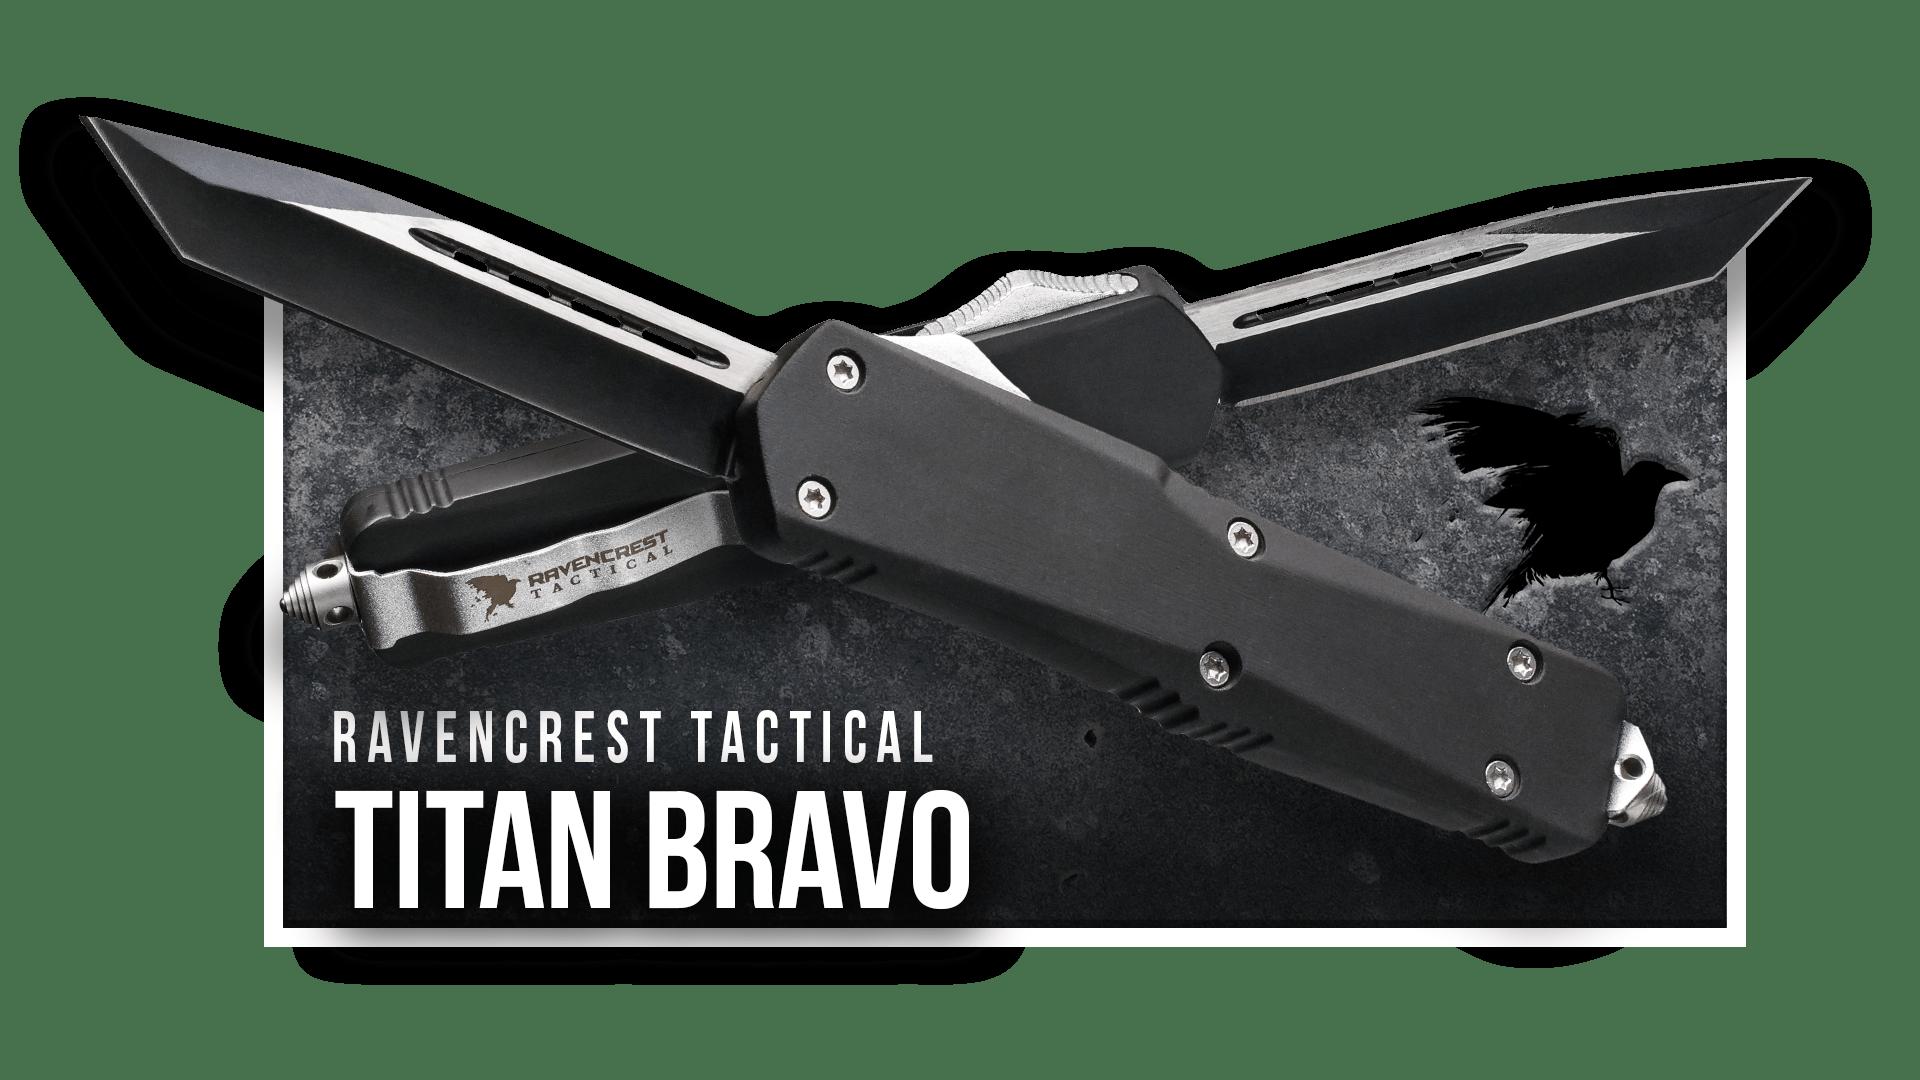 OTF Knife - Titan Bravo - RavenCrest Tactical